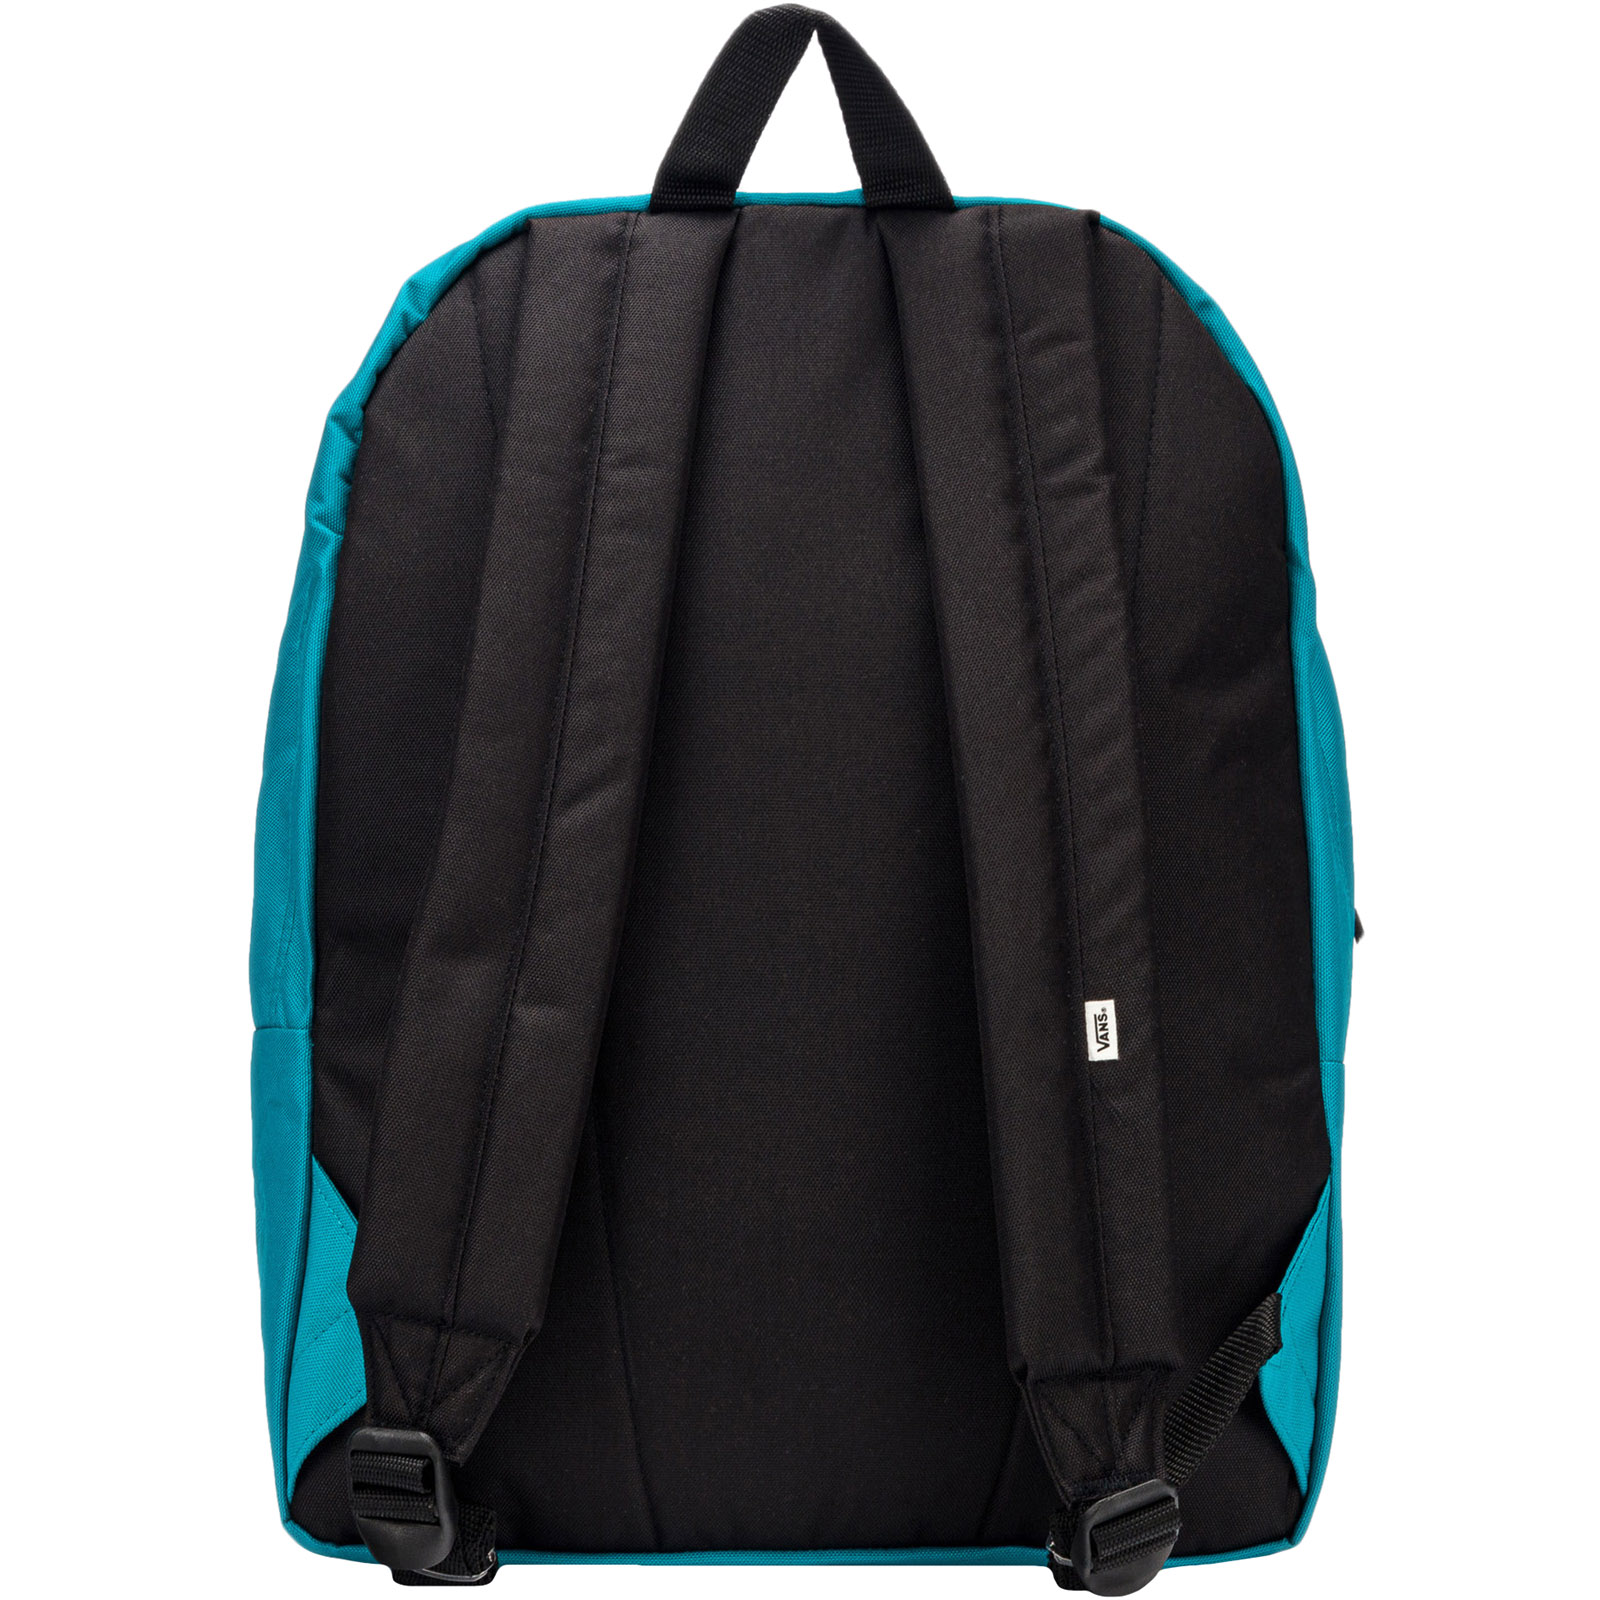 thumbnail 3 - Vans Unisex Realm Two Strap Adjustable School College Rucksack Backpack Bag